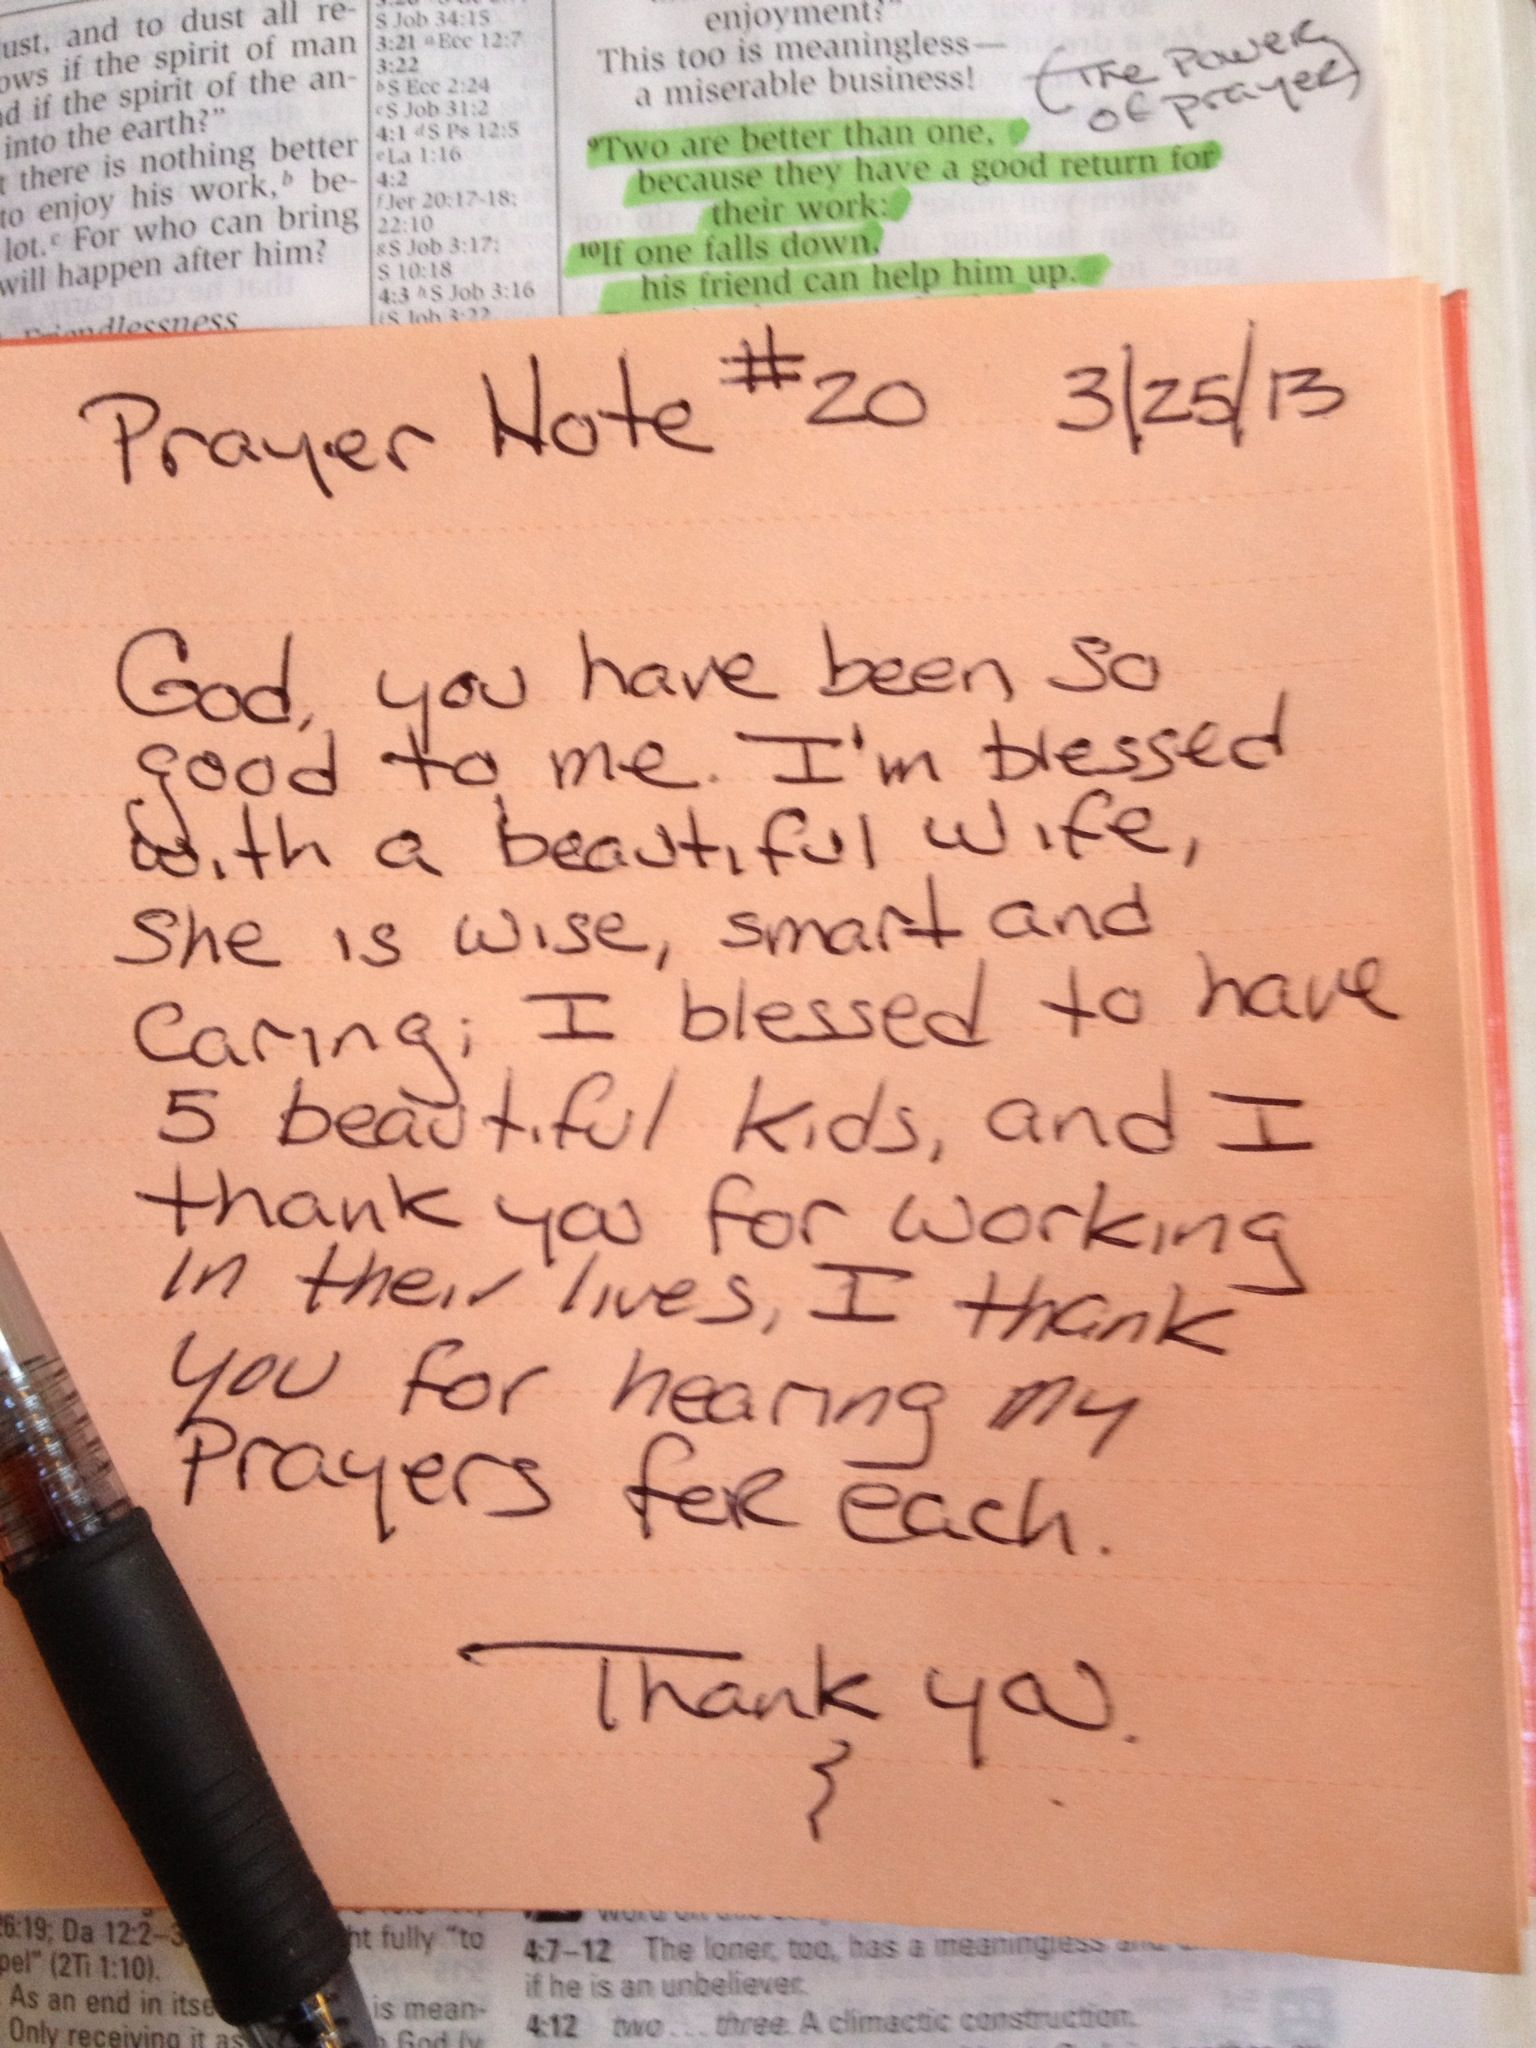 Prayer Note #20